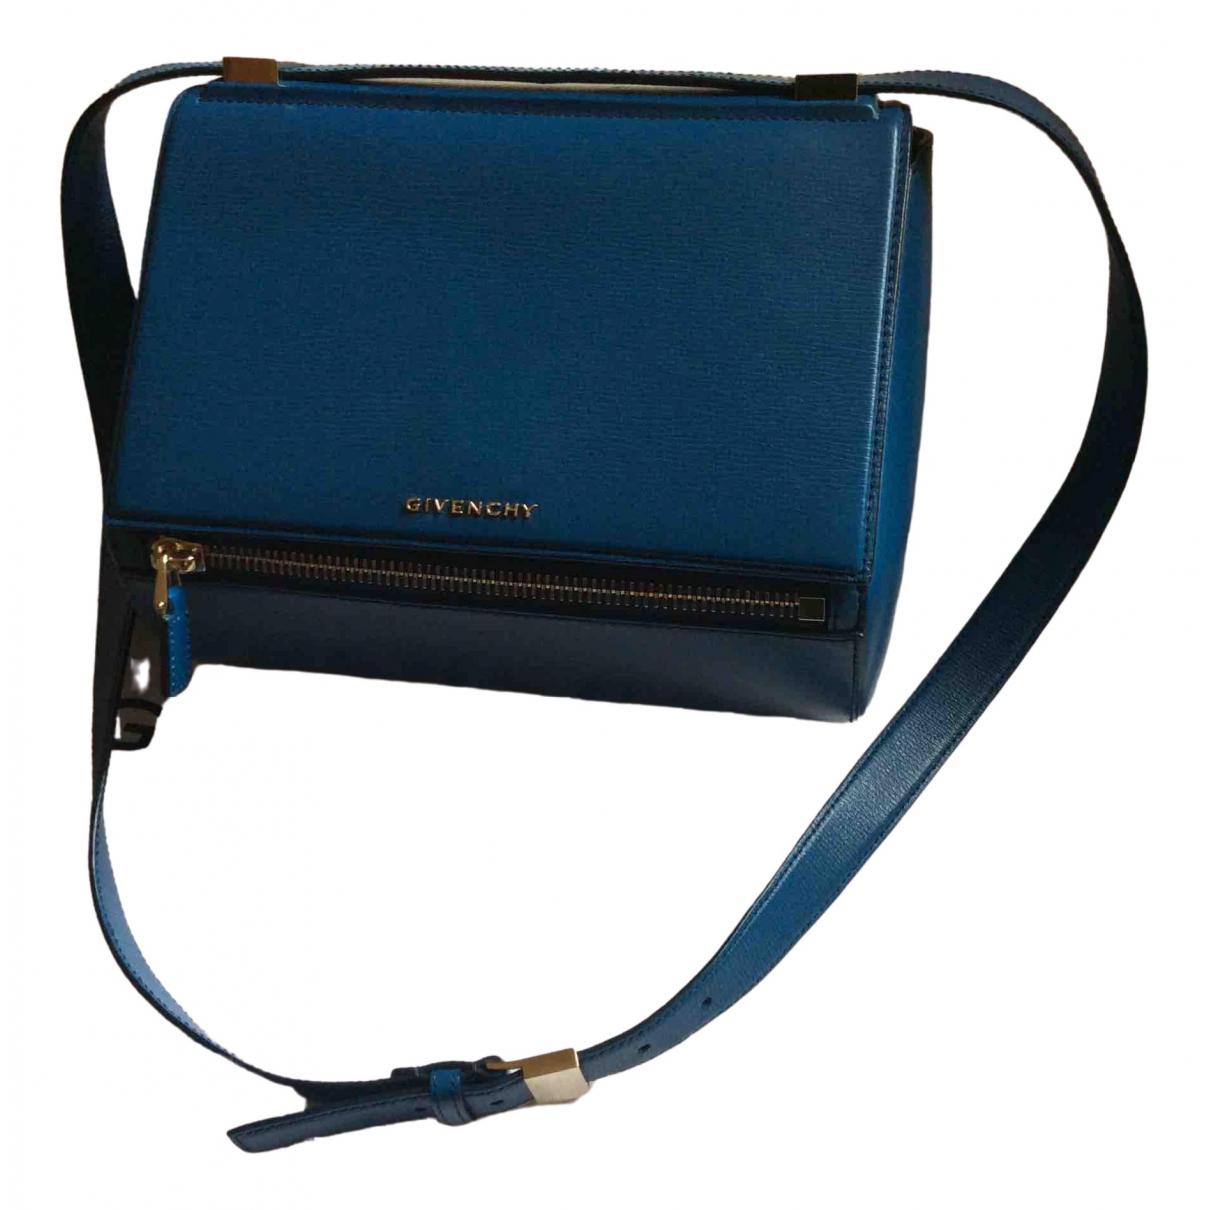 Givenchy Pandora Box Blue Leather handbag for Women \N